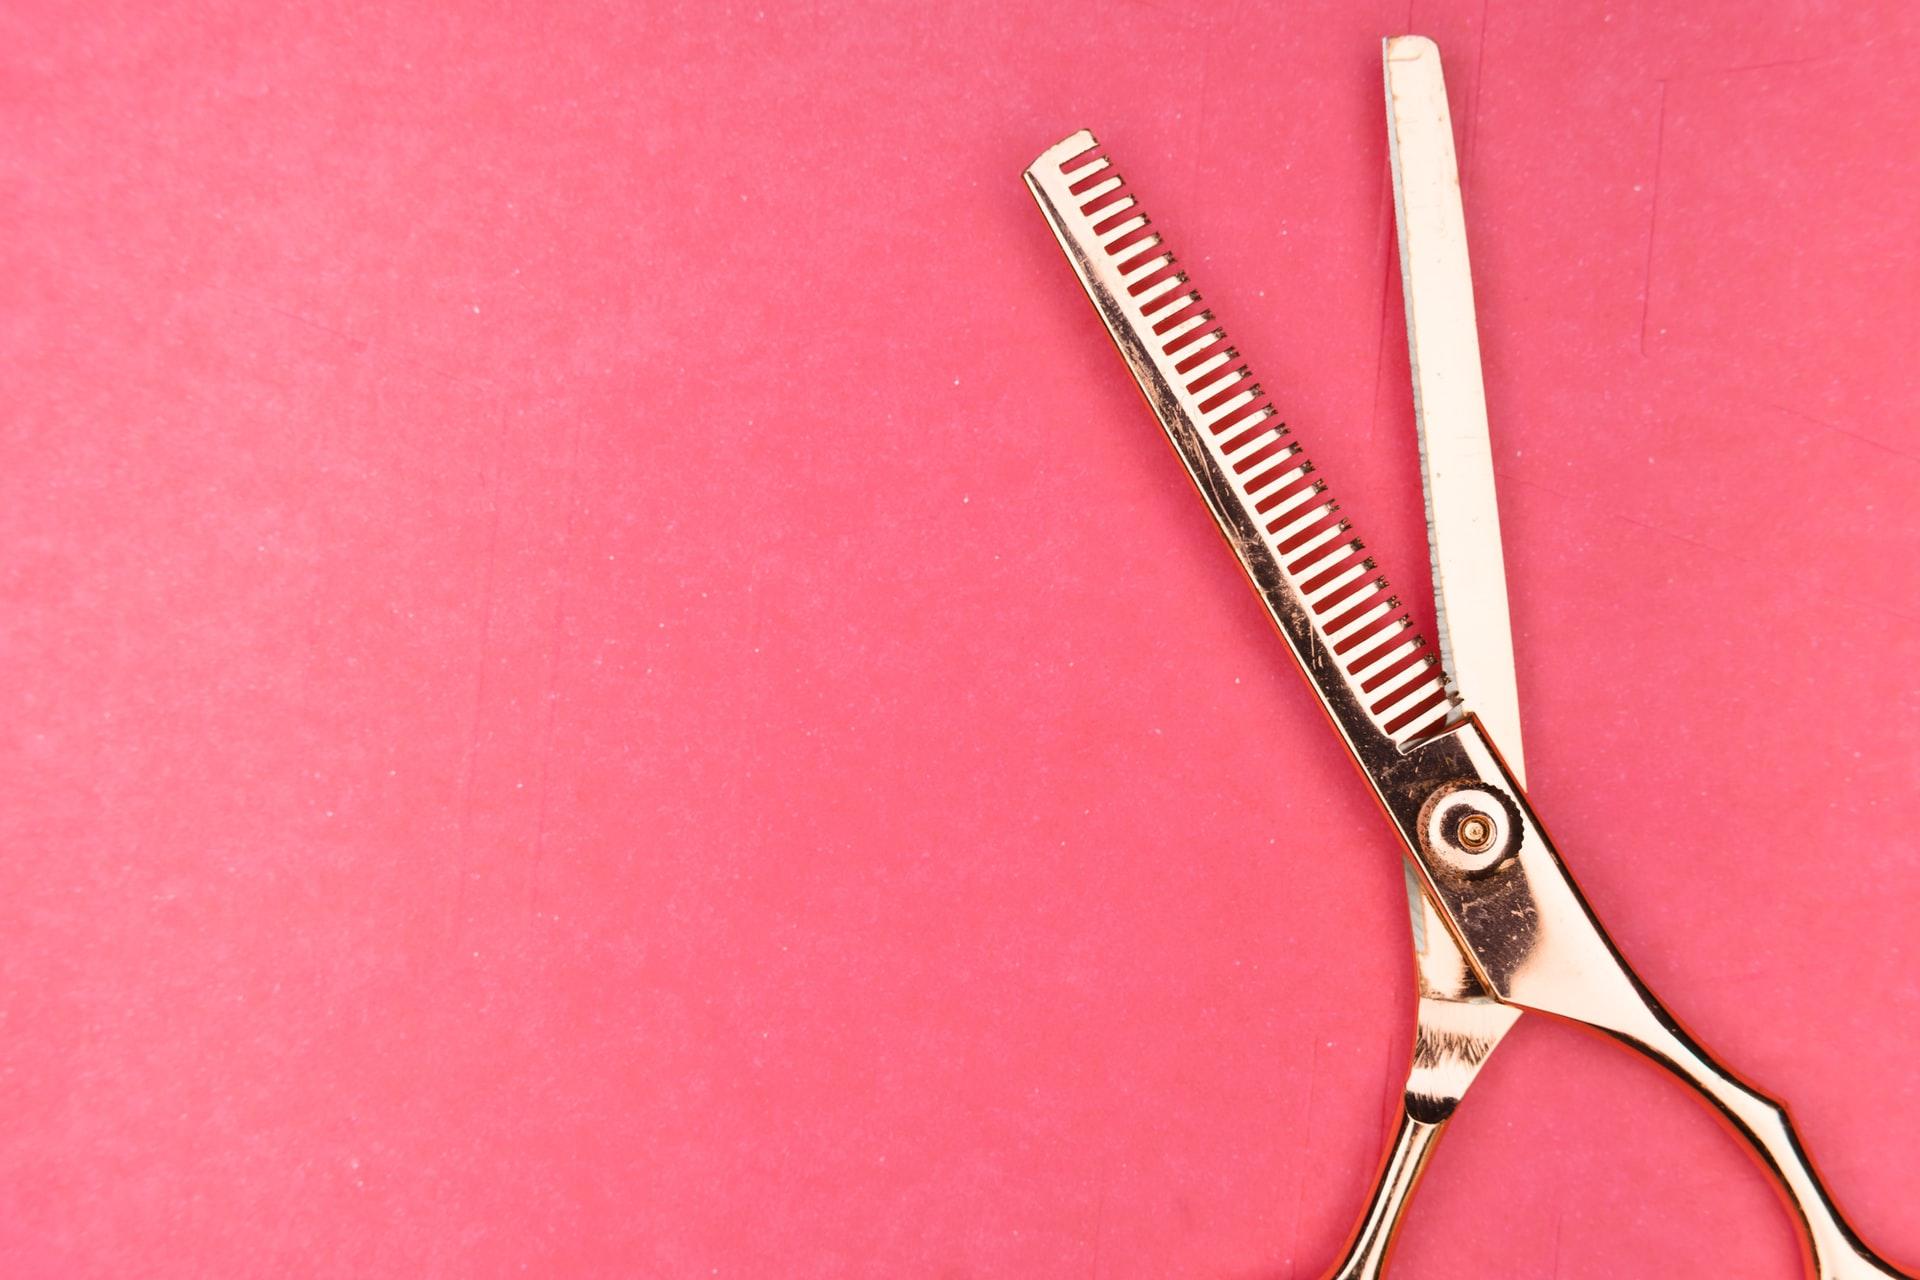 Hair scissors photo by Markus Winkler on Unsplash